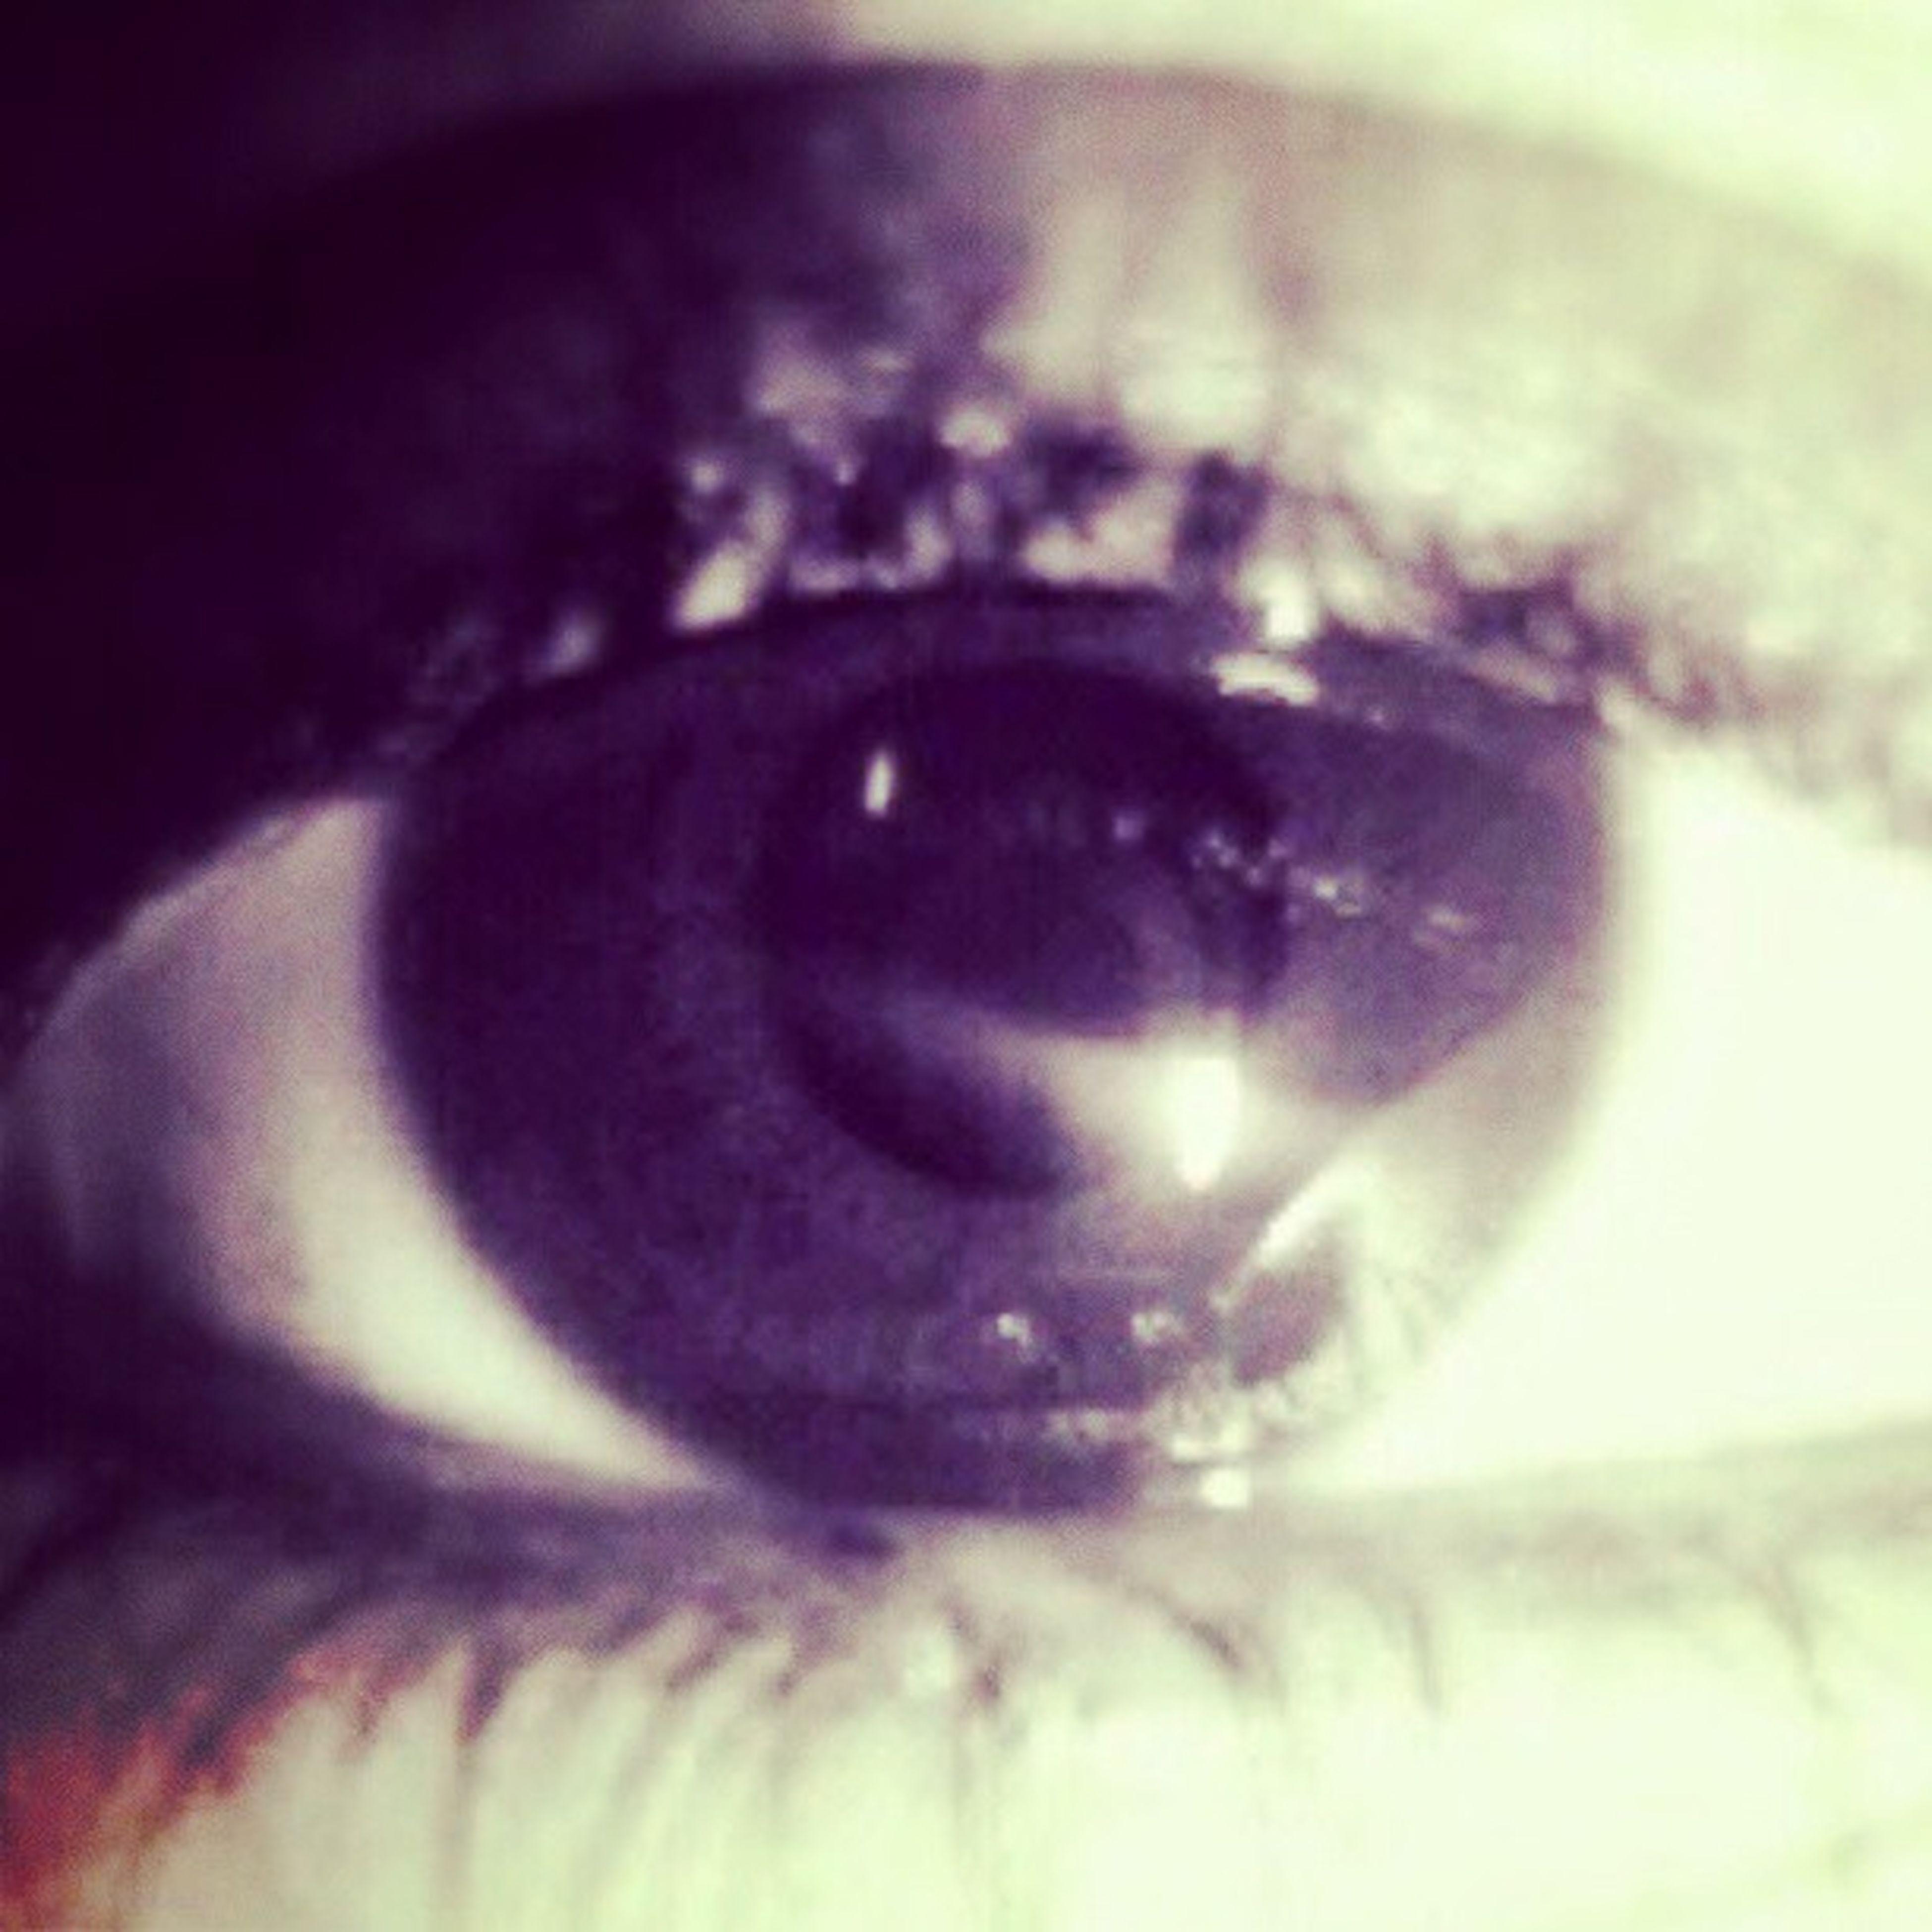 close-up, indoors, extreme close-up, selective focus, human eye, eyelash, extreme close up, part of, sensory perception, detail, eyesight, macro, focus on foreground, human skin, human face, reflection, single object